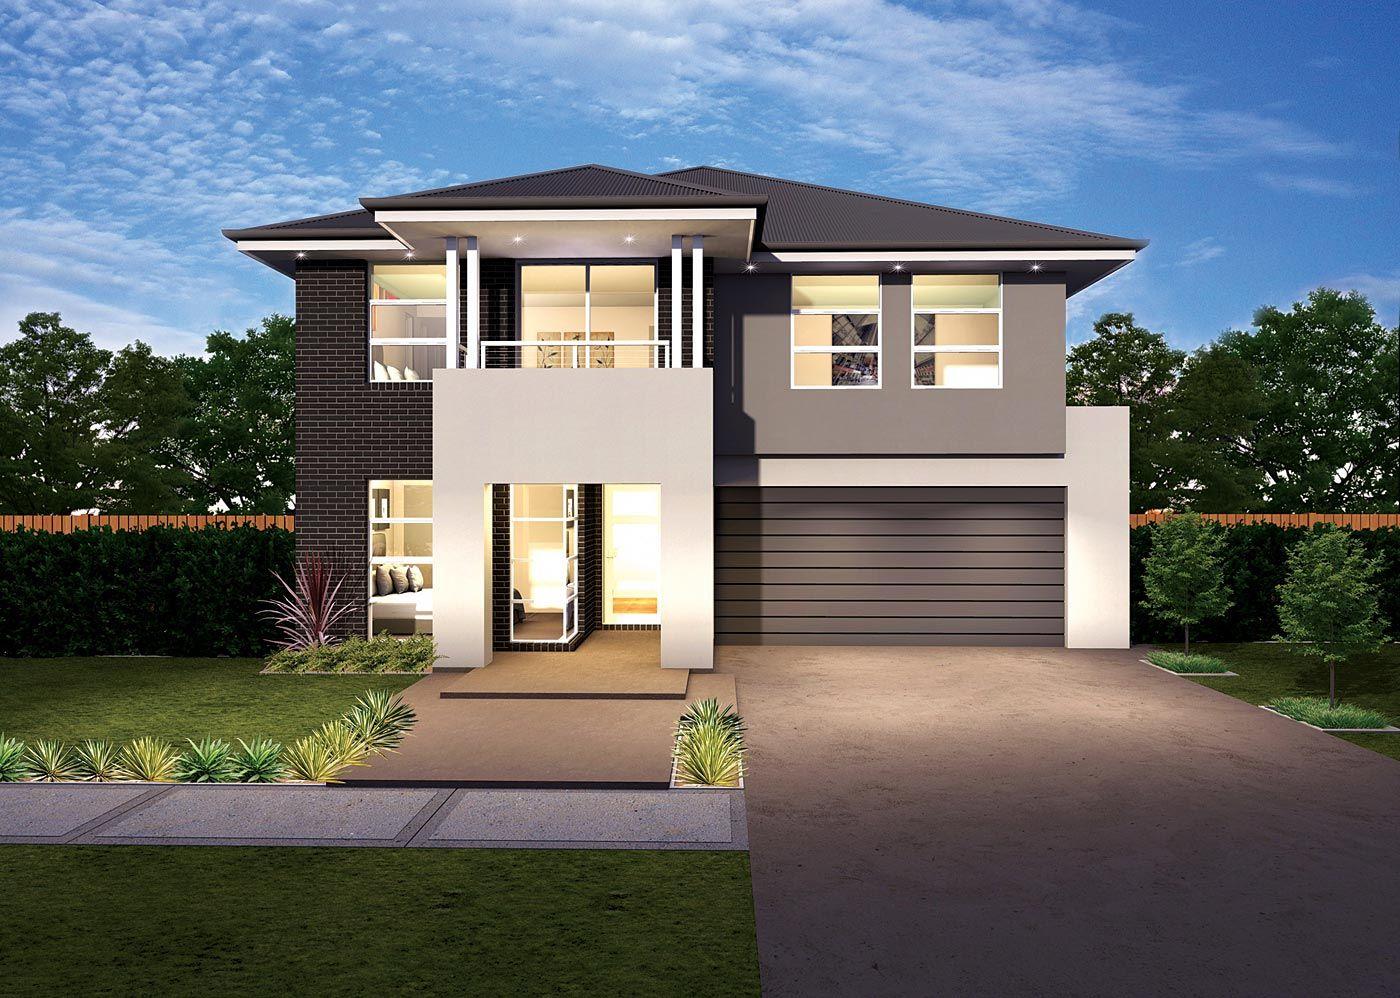 Best Images About Dream Home On Pinterest Home Design Villas - Dream home design